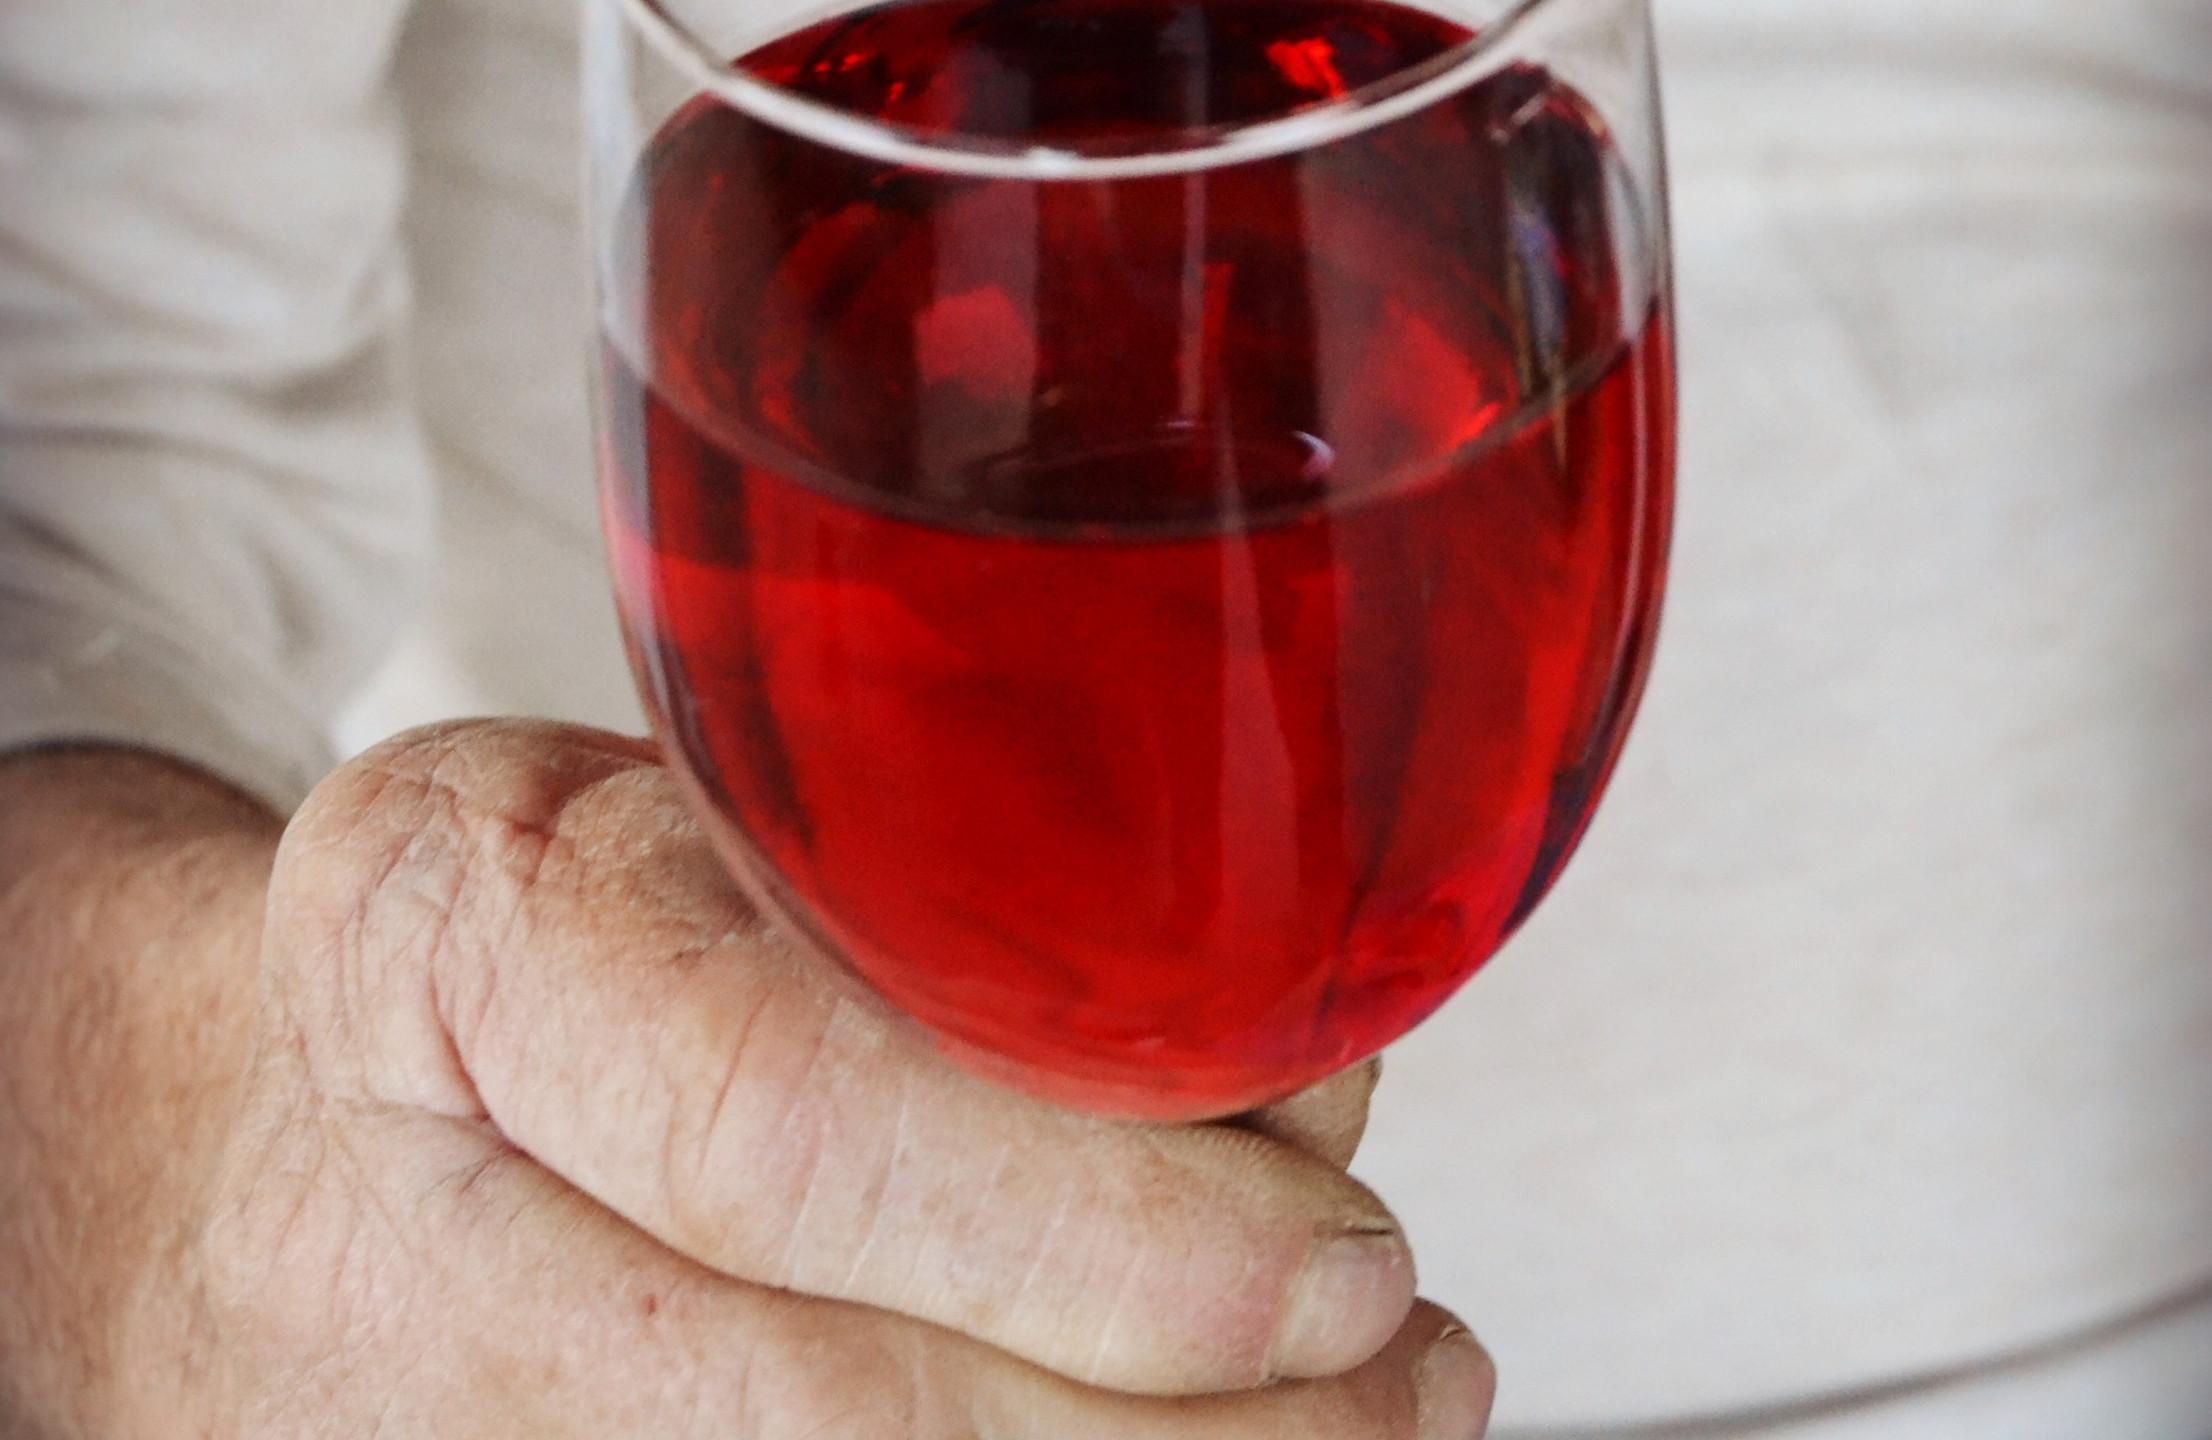 dads wine